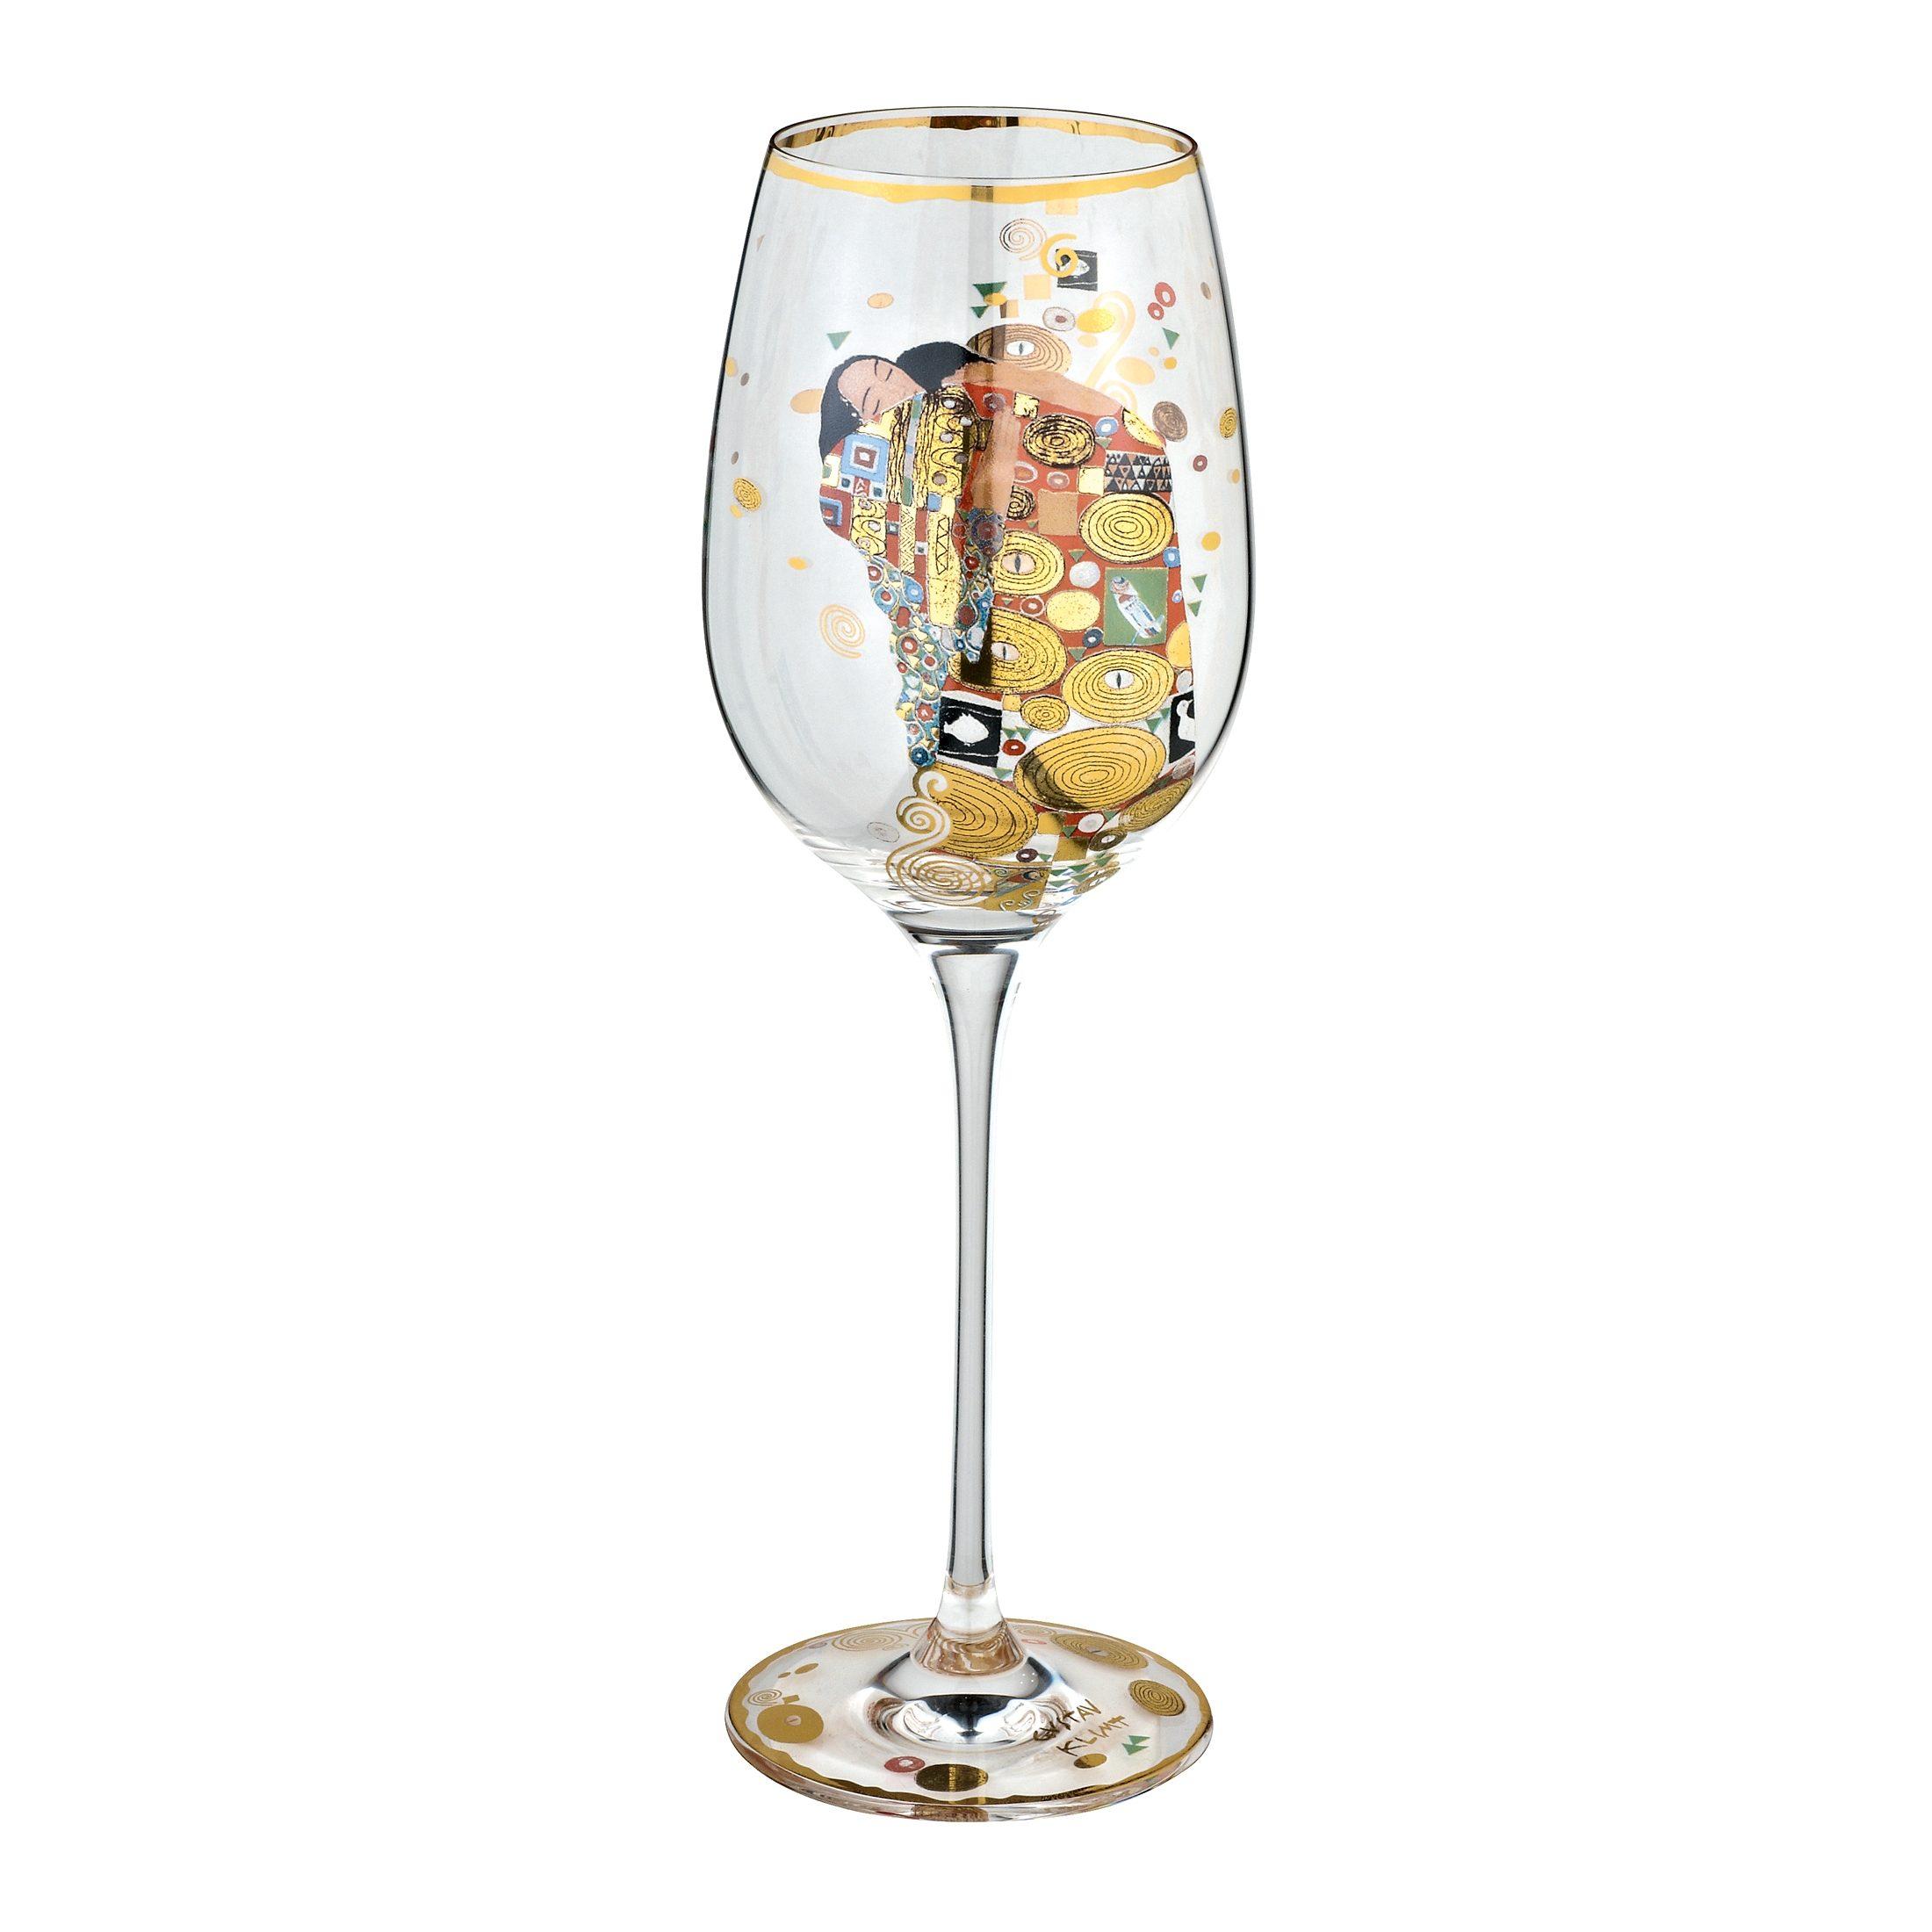 Goebel Die Erfüllung Weinglas »Artis Orbis«